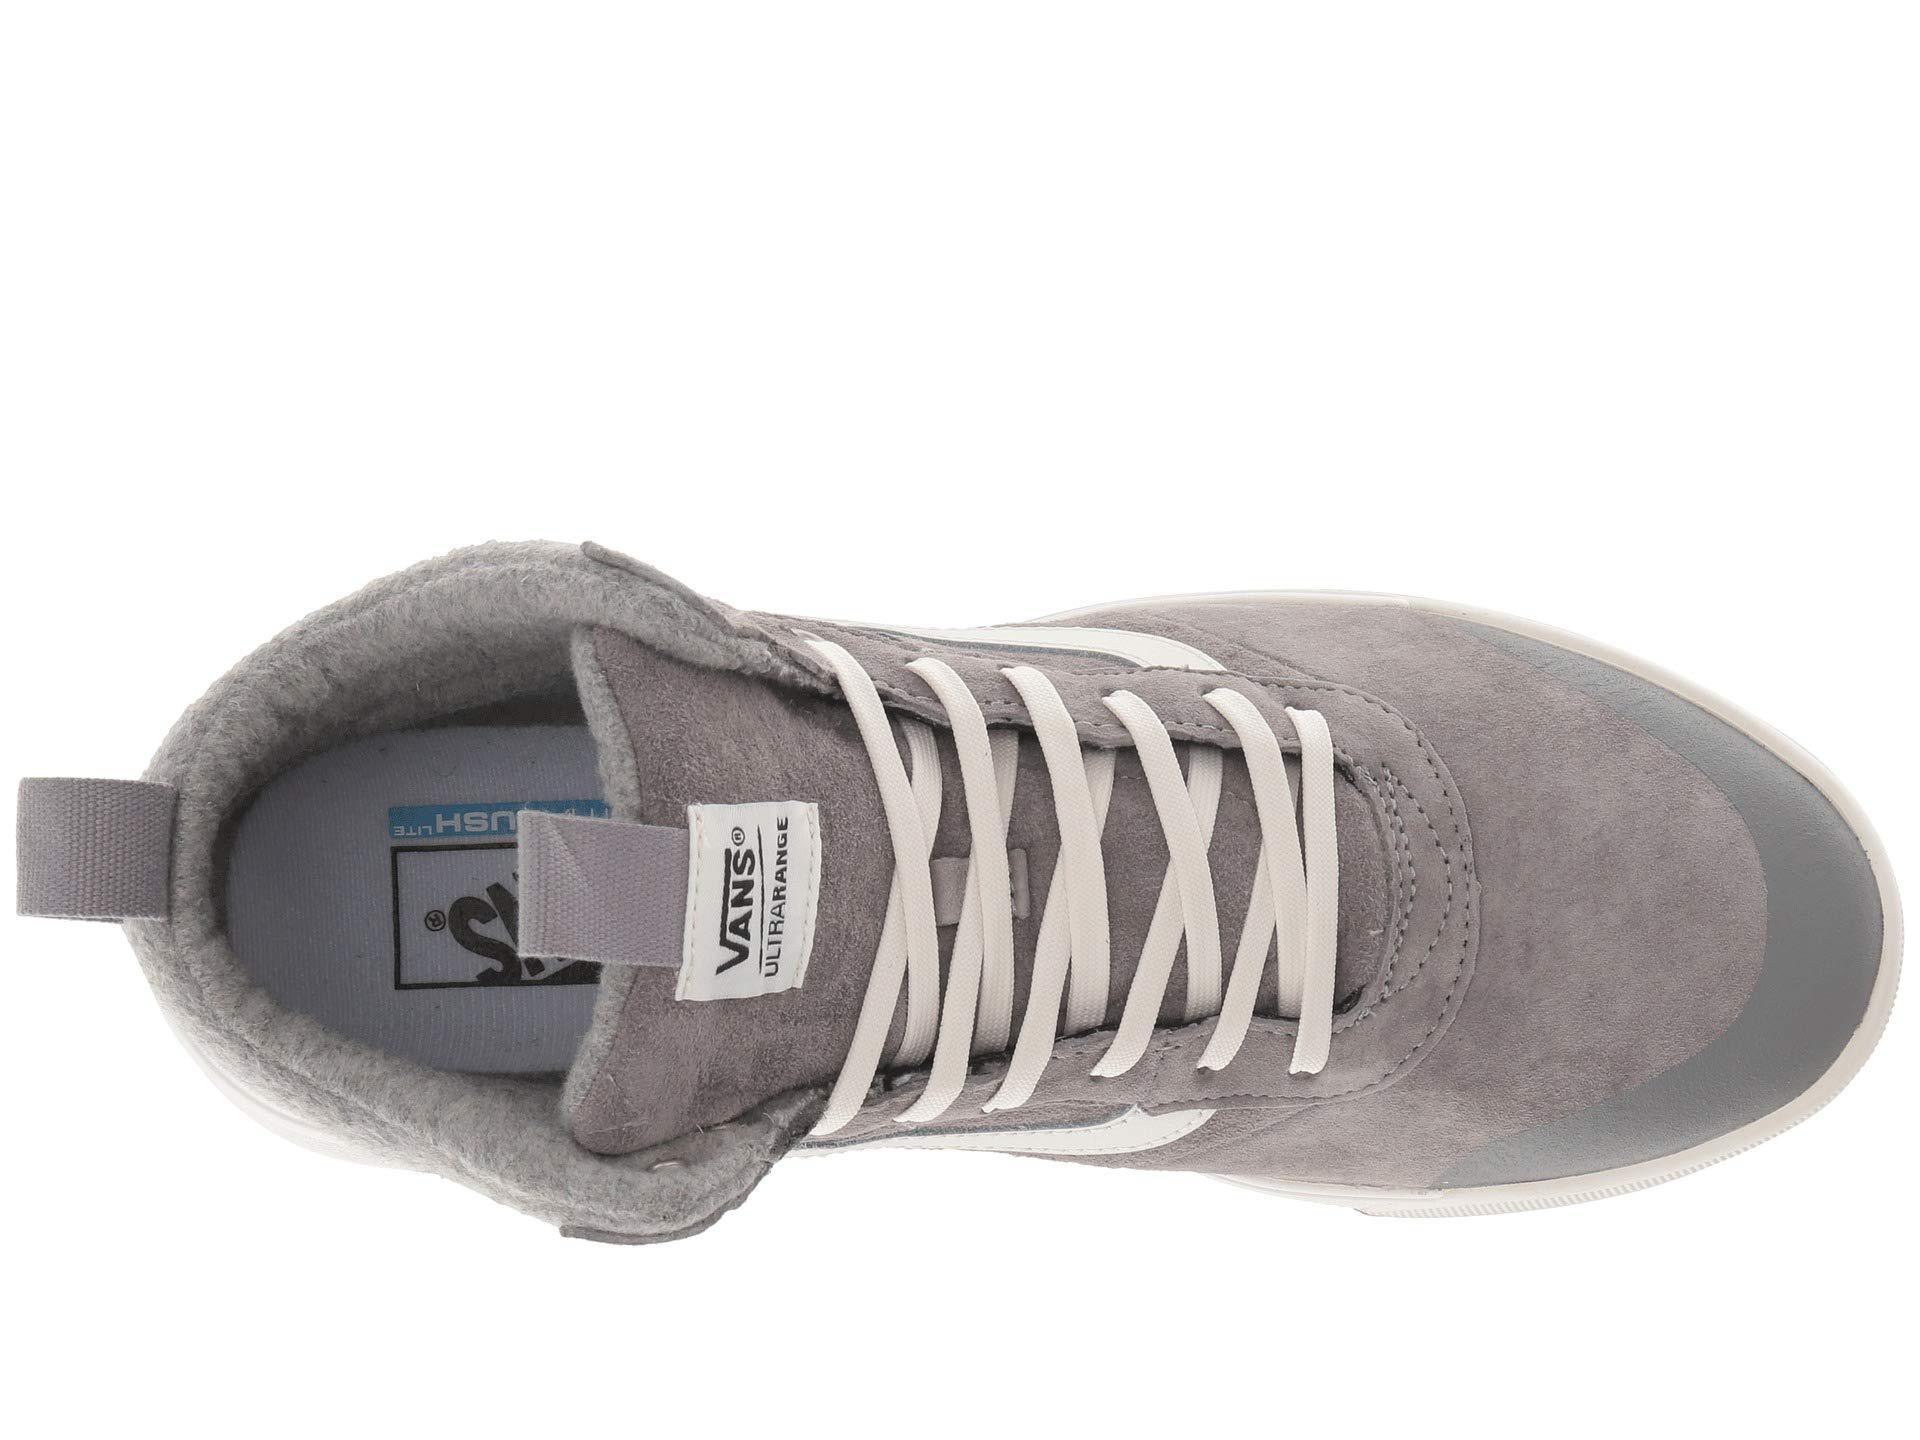 Lyst - Vans Ultrarange Hi Mte ((wool) Asphalt) Skate Shoes in Gray ... 4df1874e0